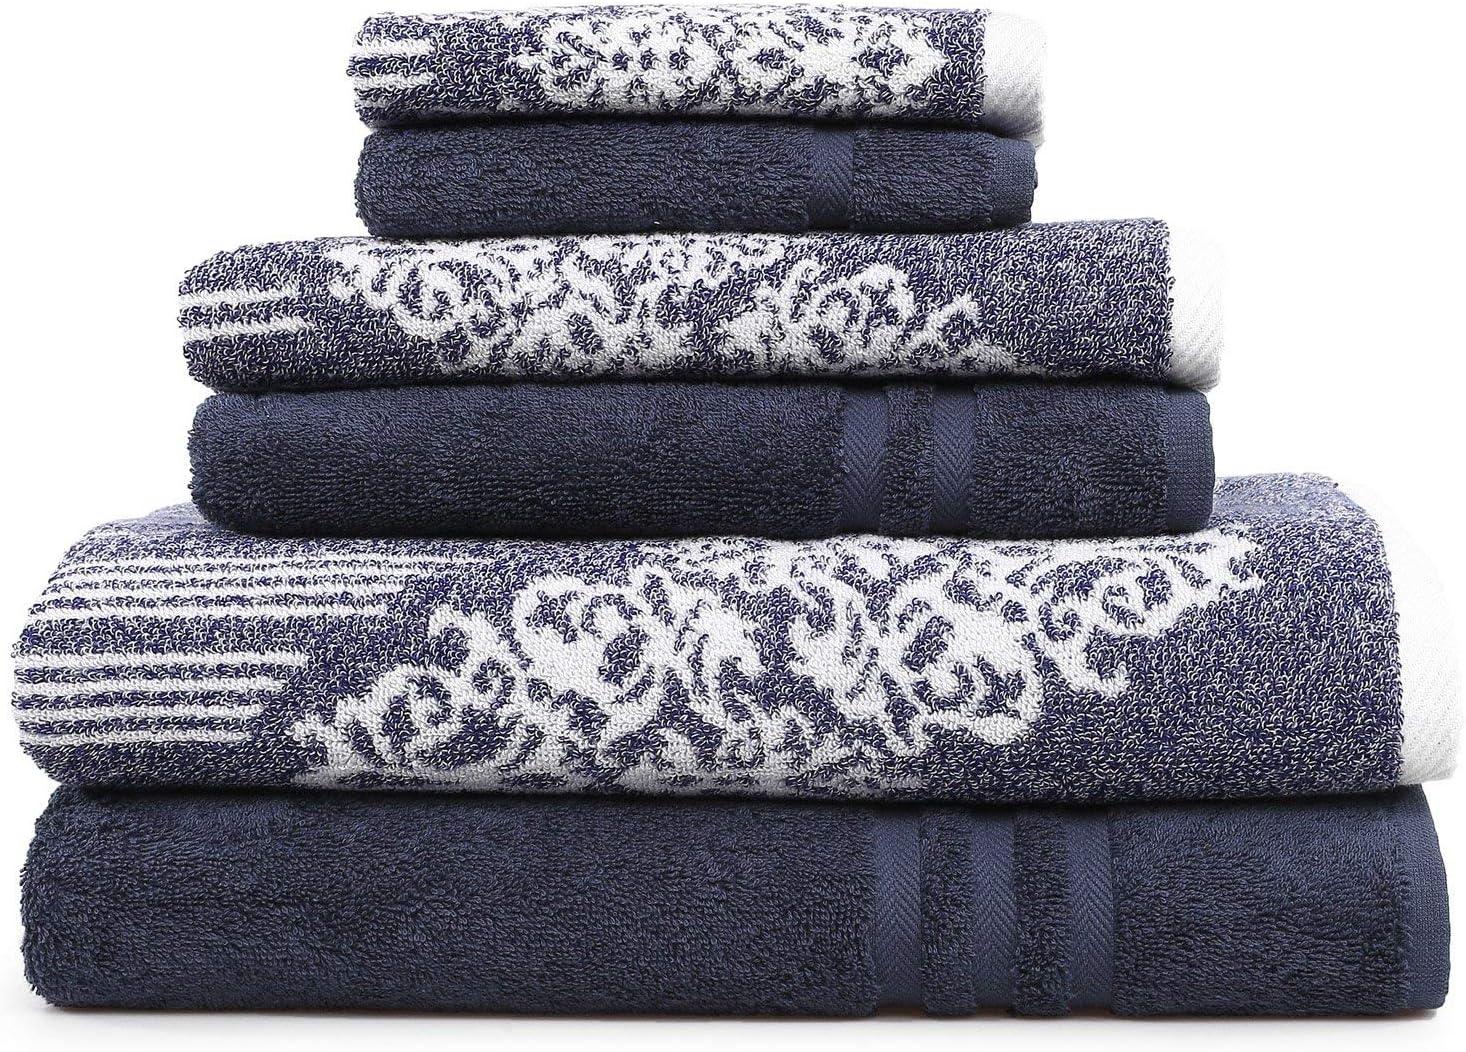 Linum Home Textiles Gioia-Denzi Bath Towel, (6 Piece), Ocean Blue/Twilight Blue